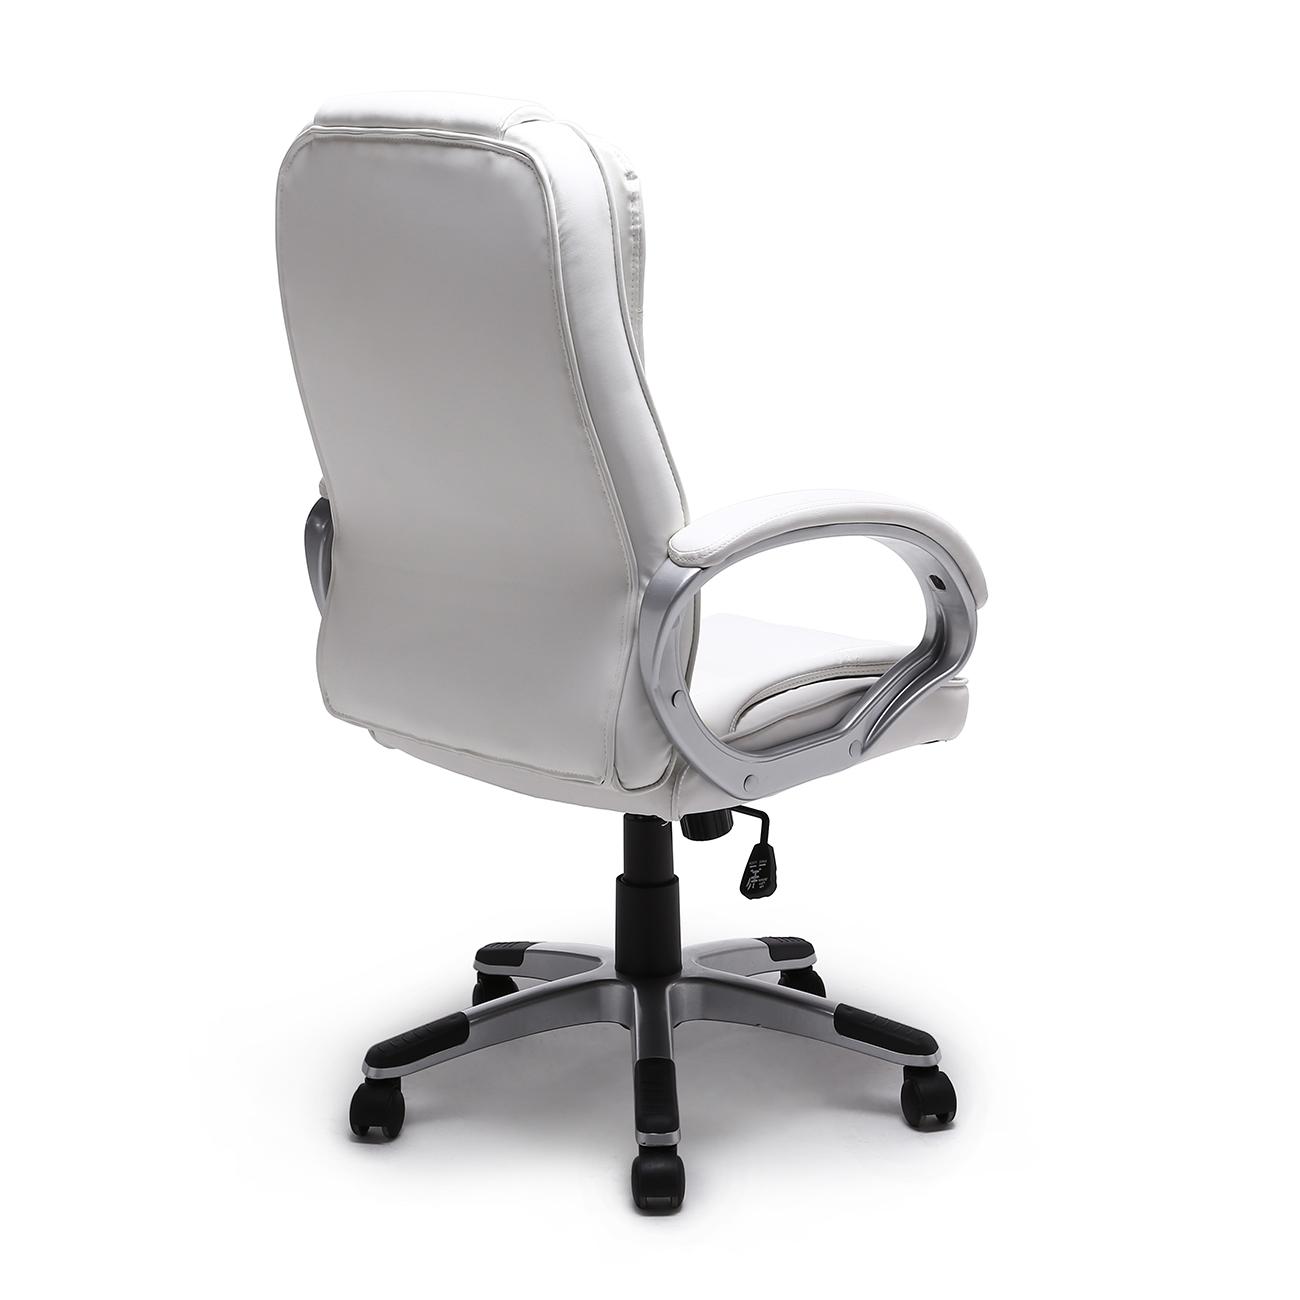 high back pu leather executive ergonomic office chair desk task